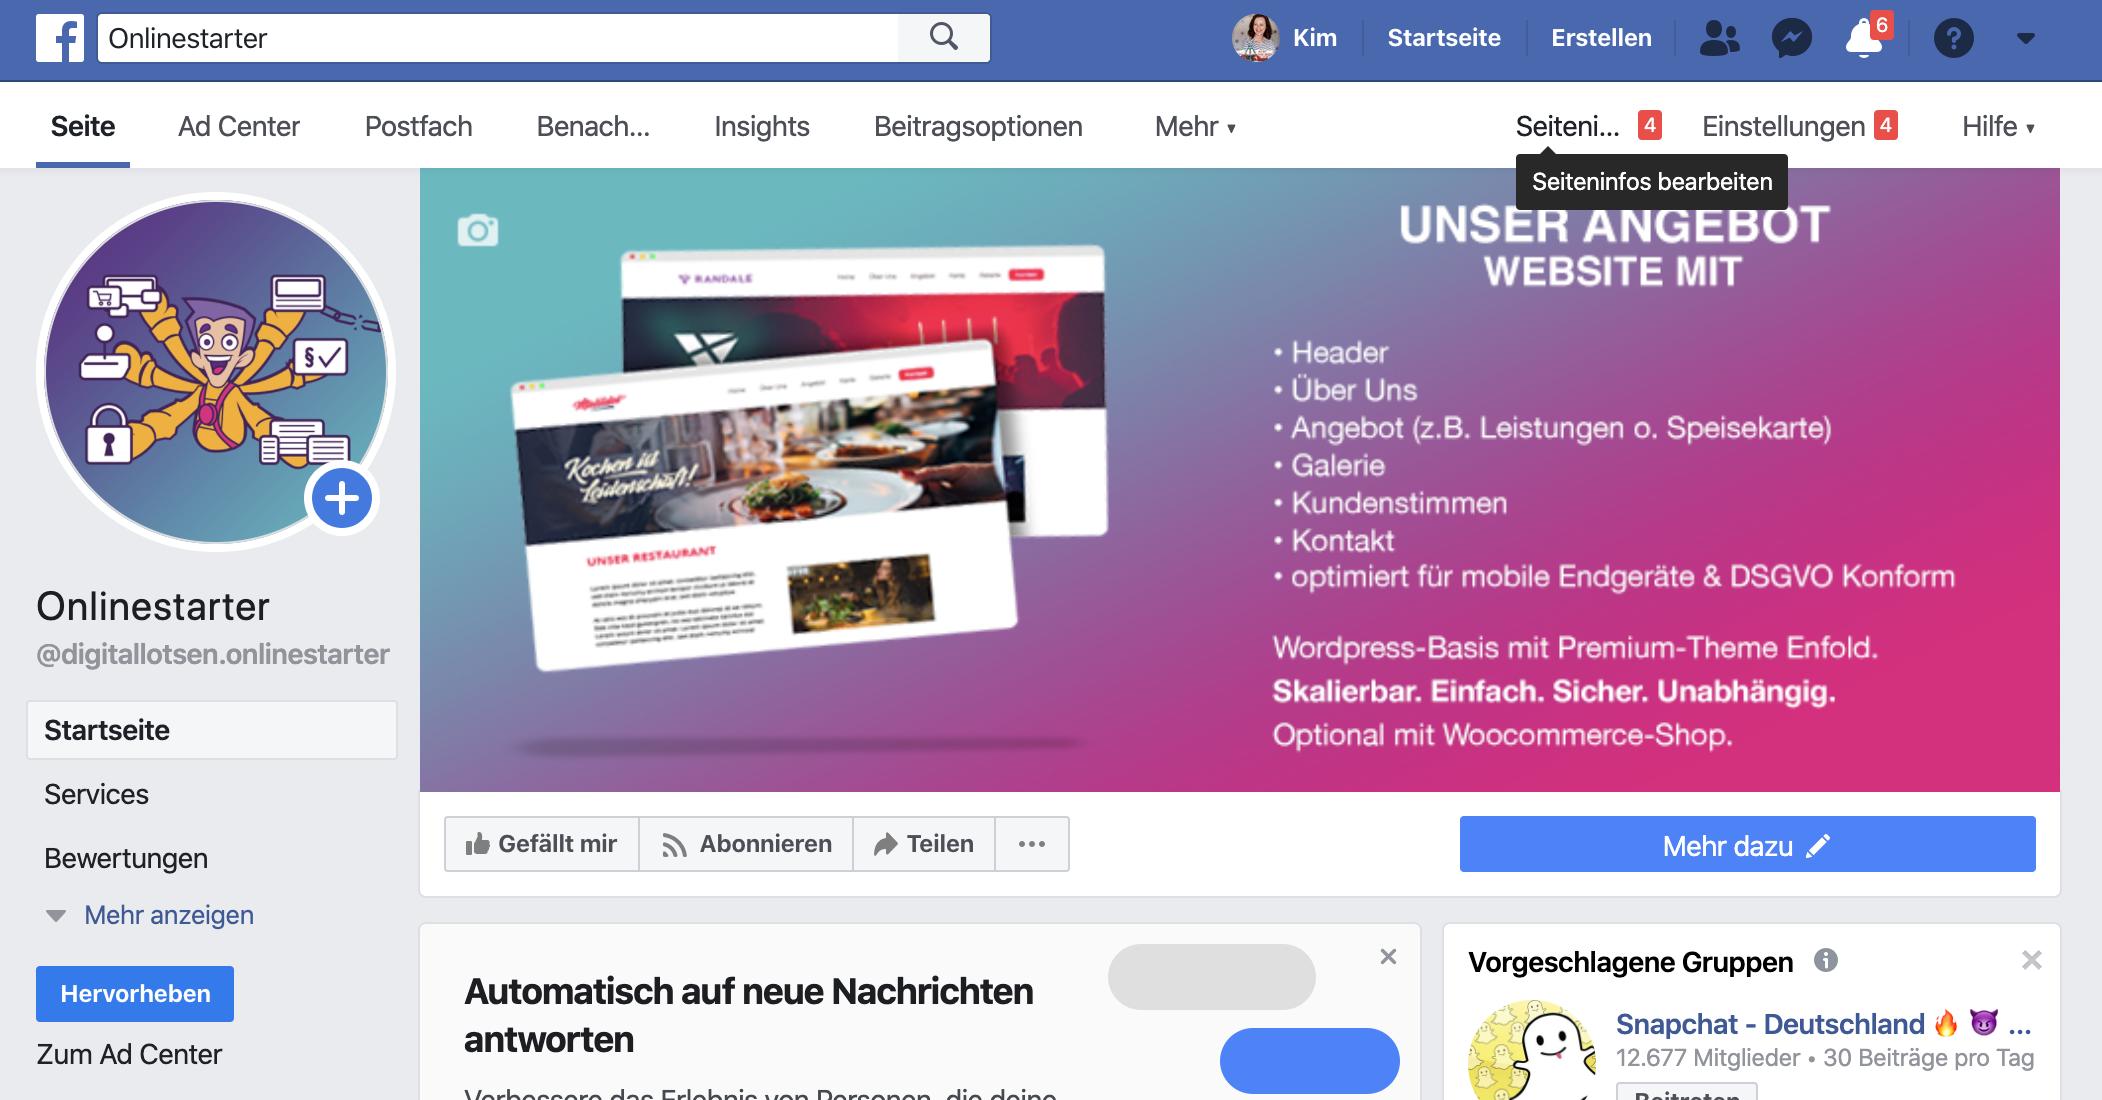 Facebookseite erstellen - Seiteninfos bearbeiten